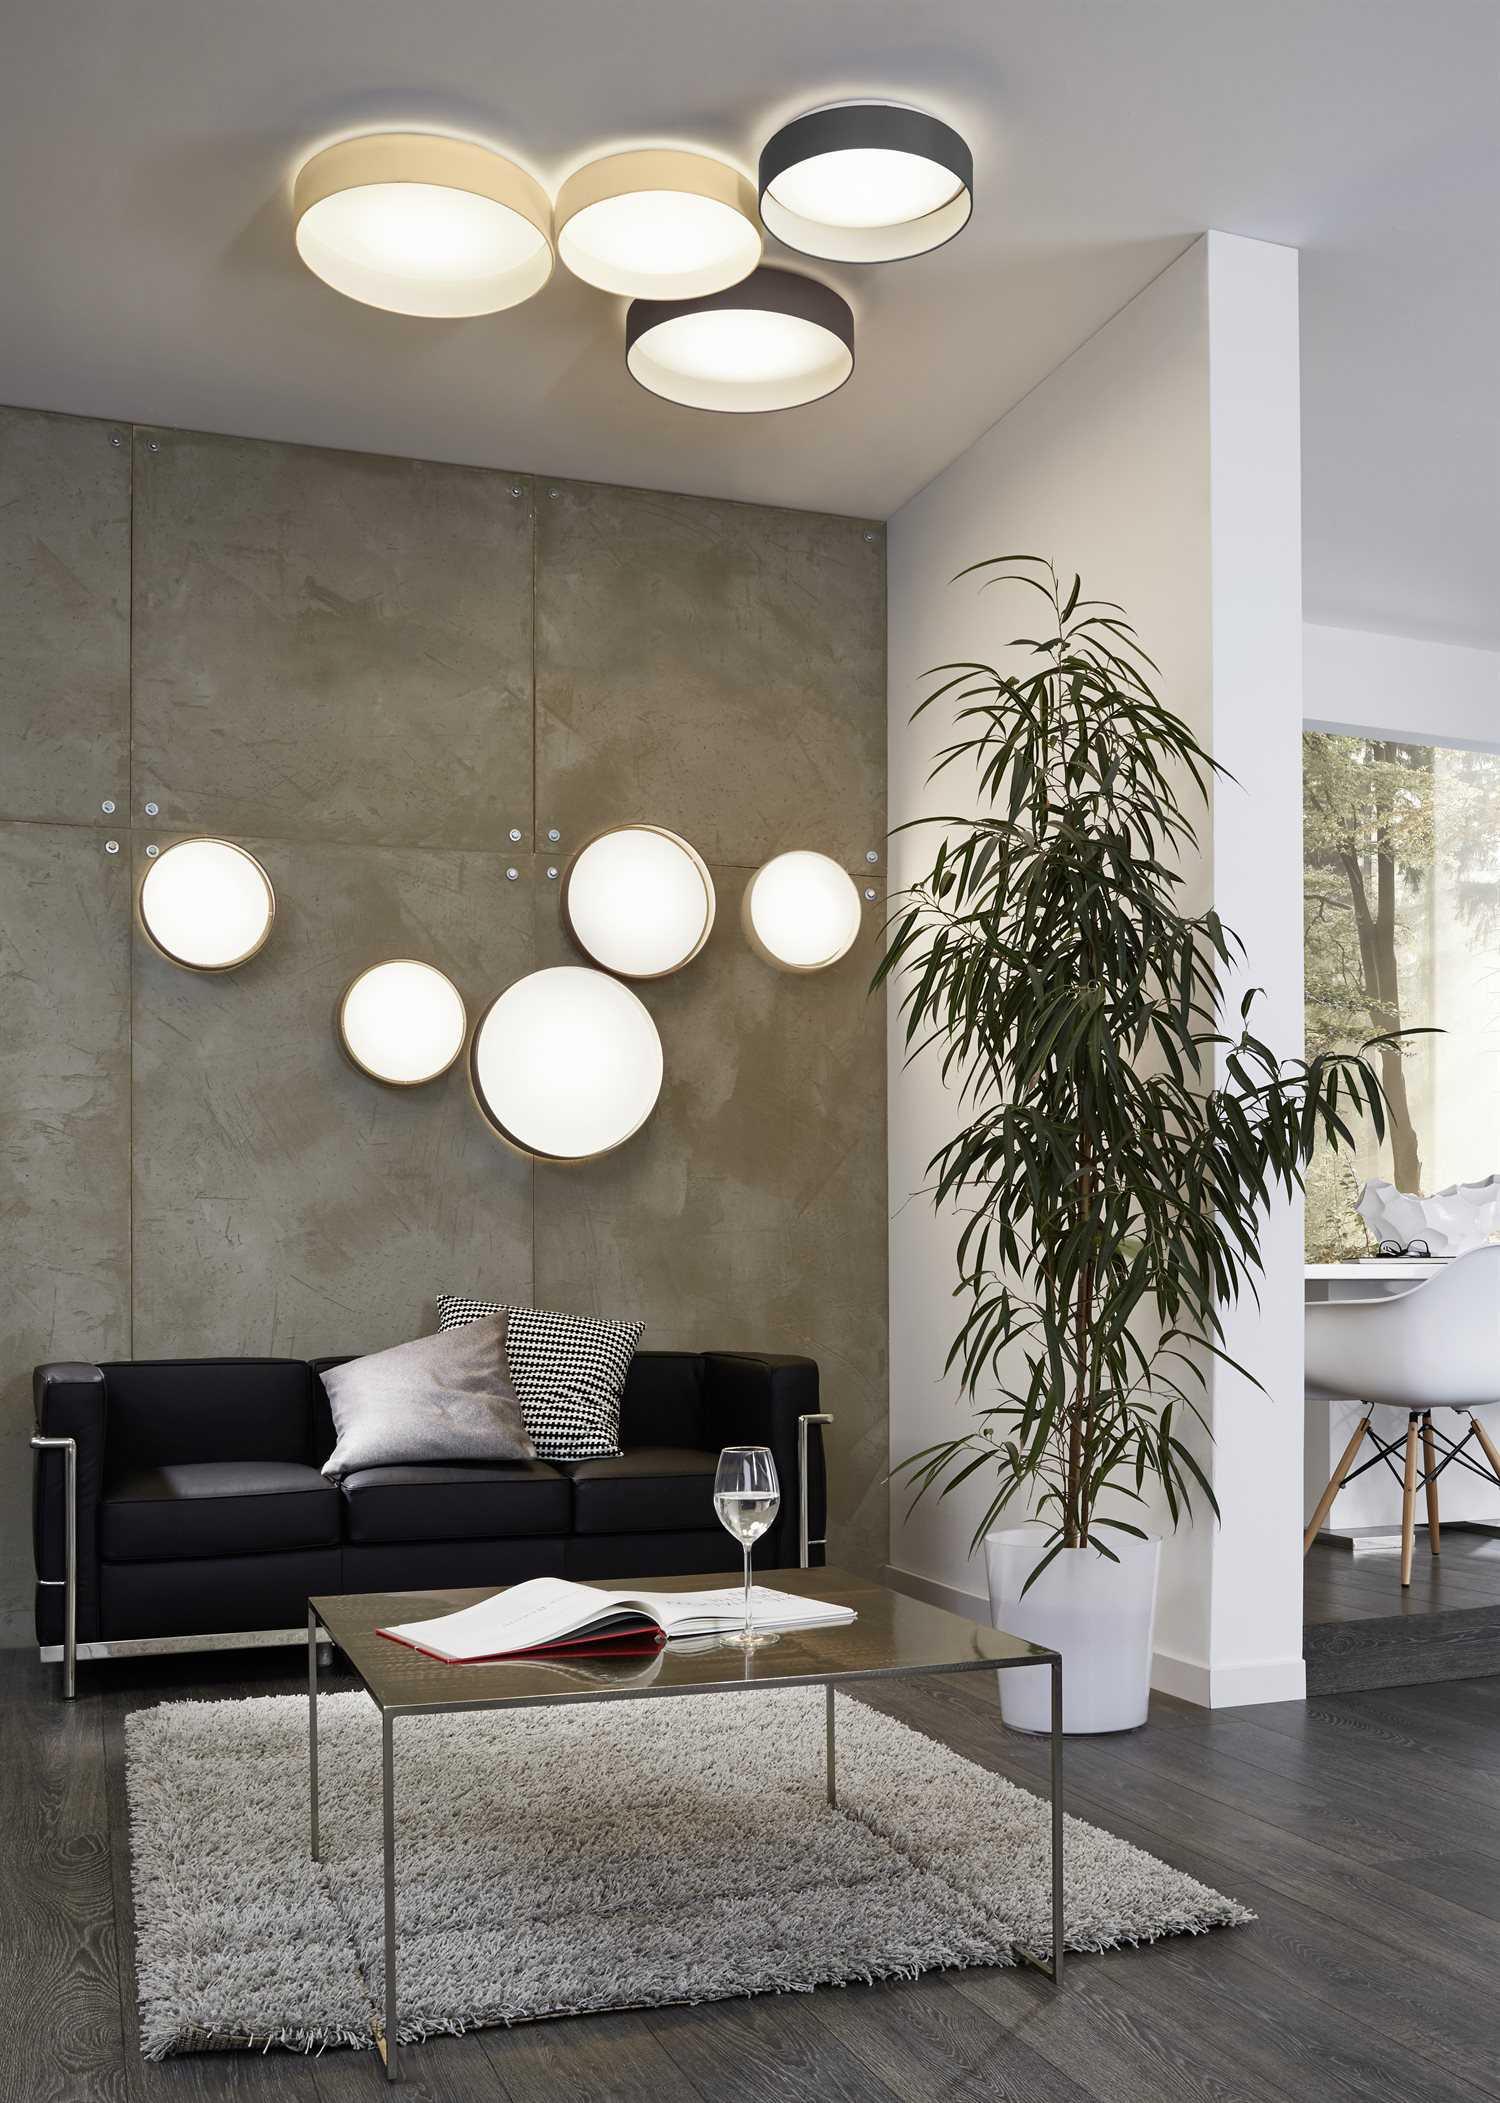 aluminum lounge chairs evenflo high chair recall canada eglo palomaro white 13'' wide led flush mount light   egl93386a